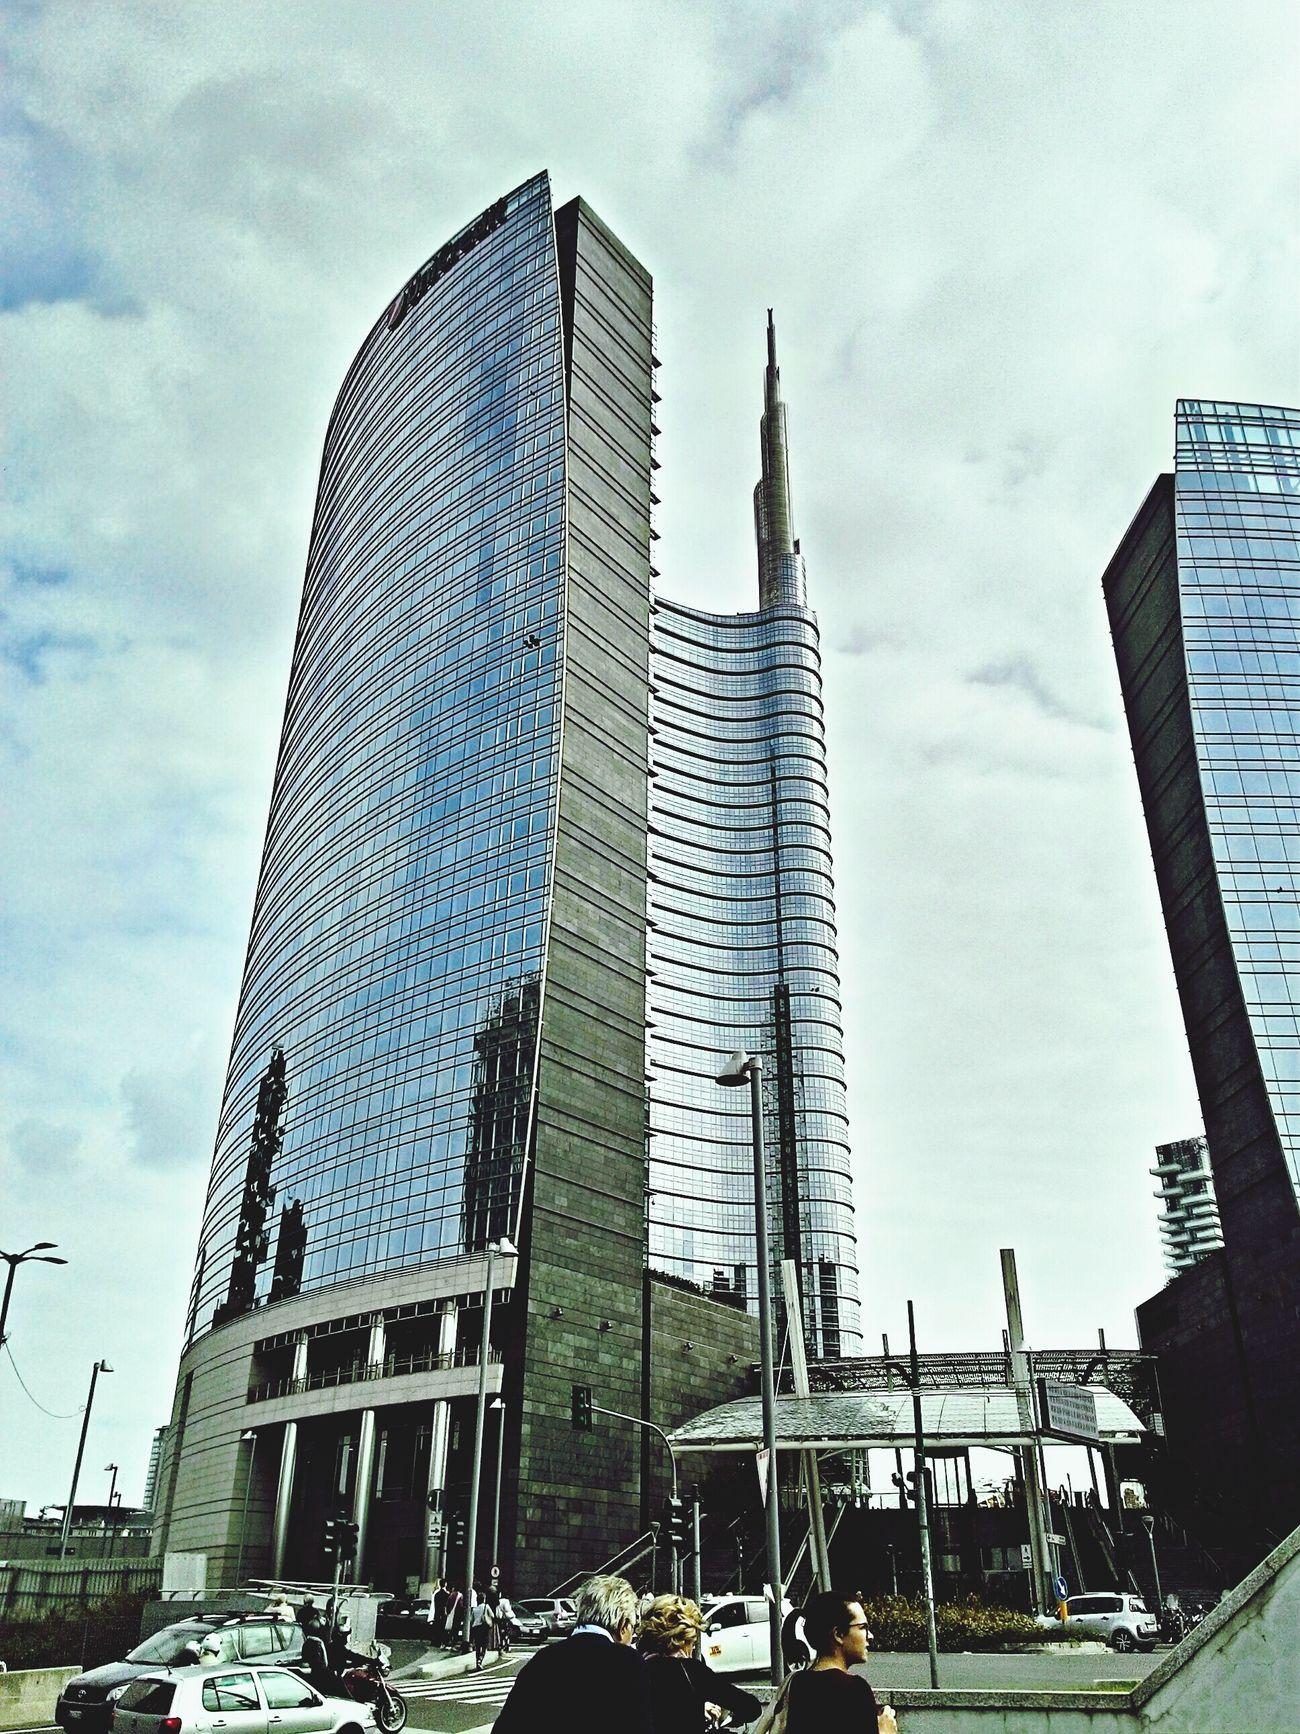 Allianztower Milano DowntownMilano Downtown Milan,Italy City City Skyline